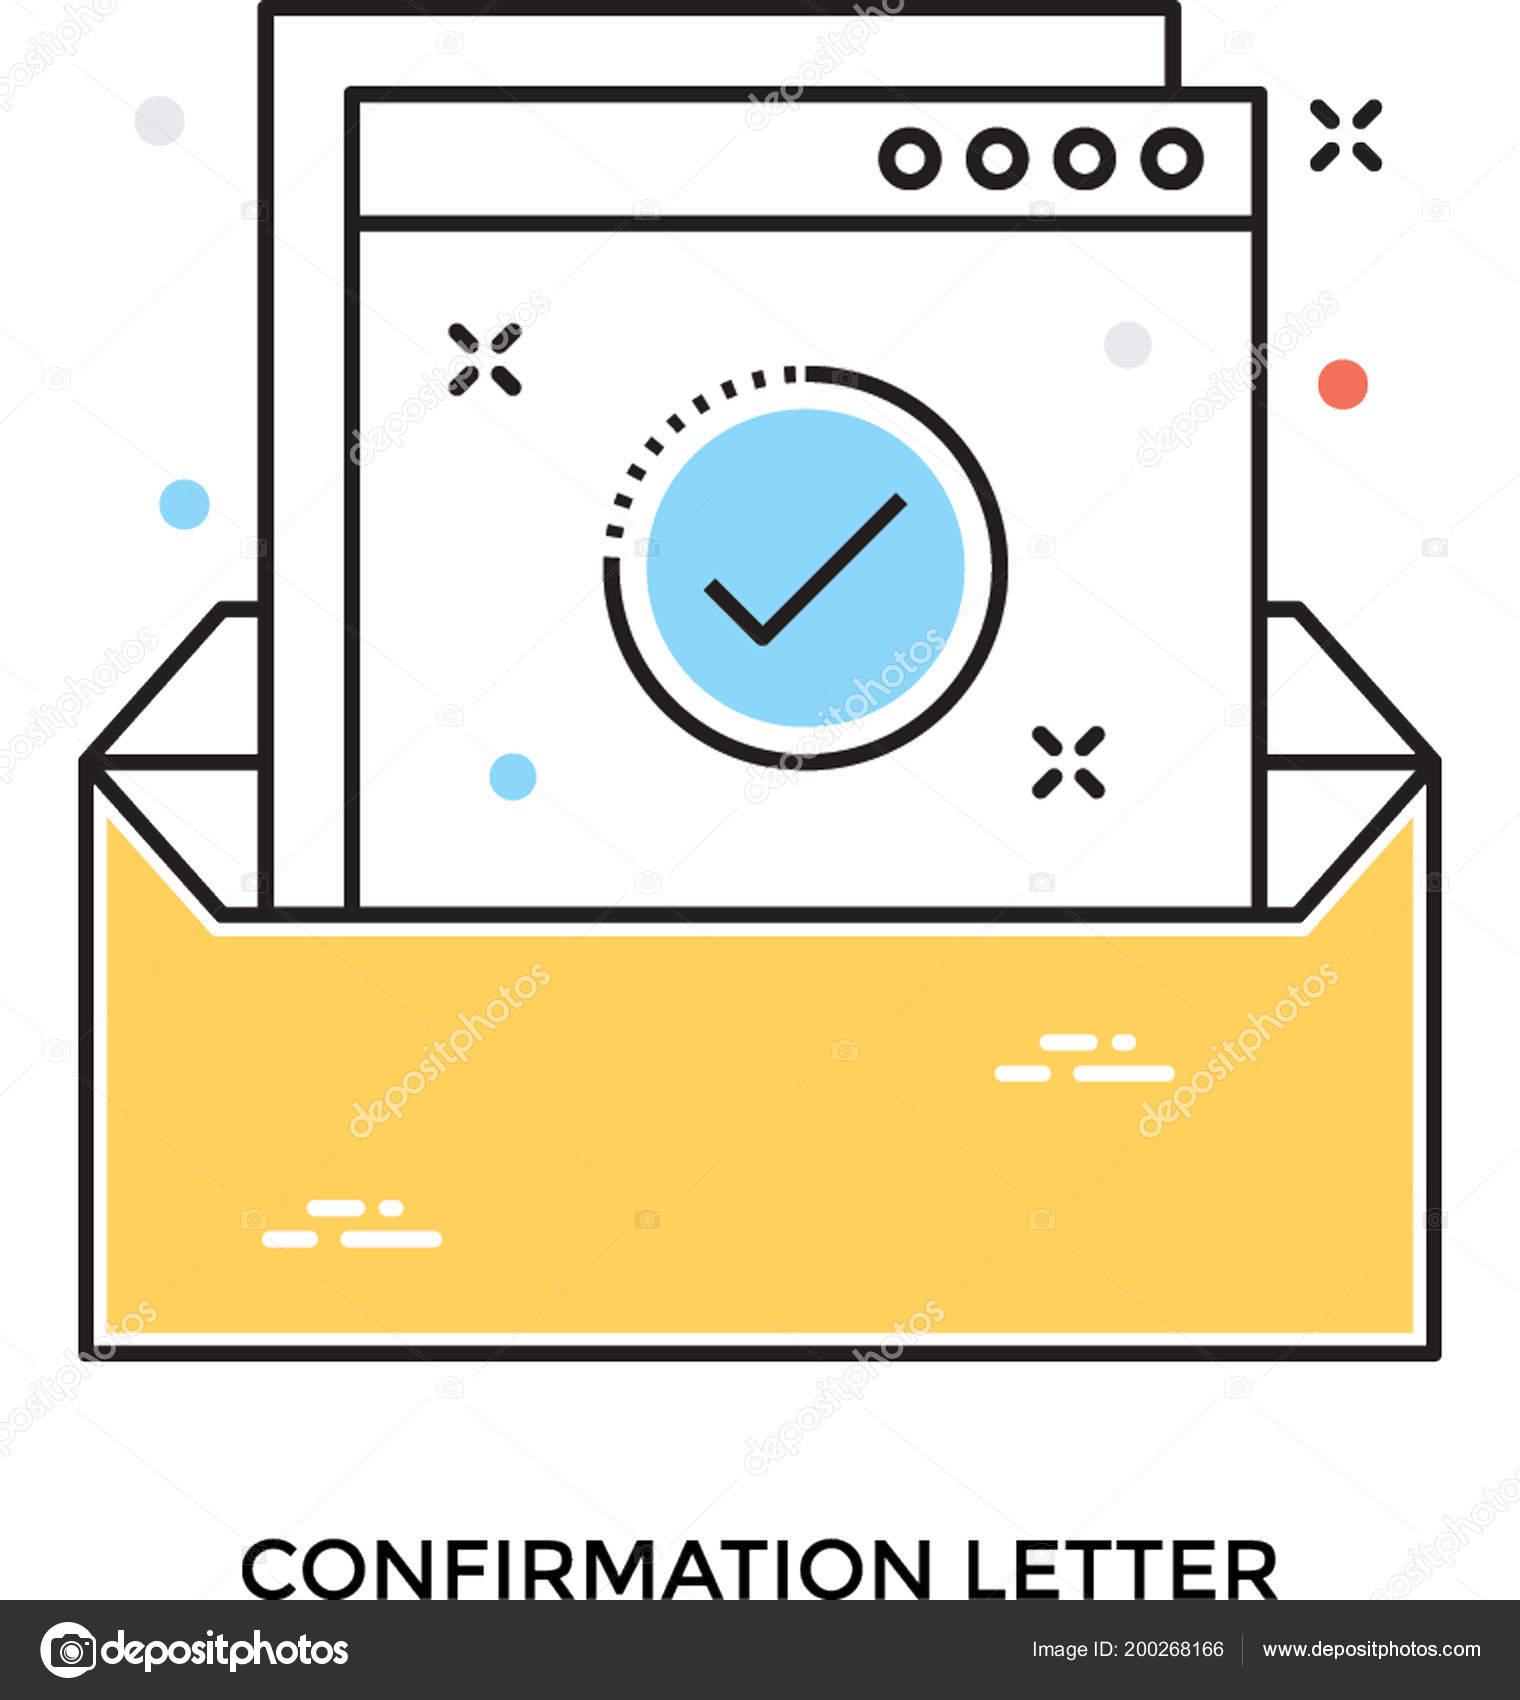 Bestätigung Brief Flache Vektor Icon Stockvektor Creativestall